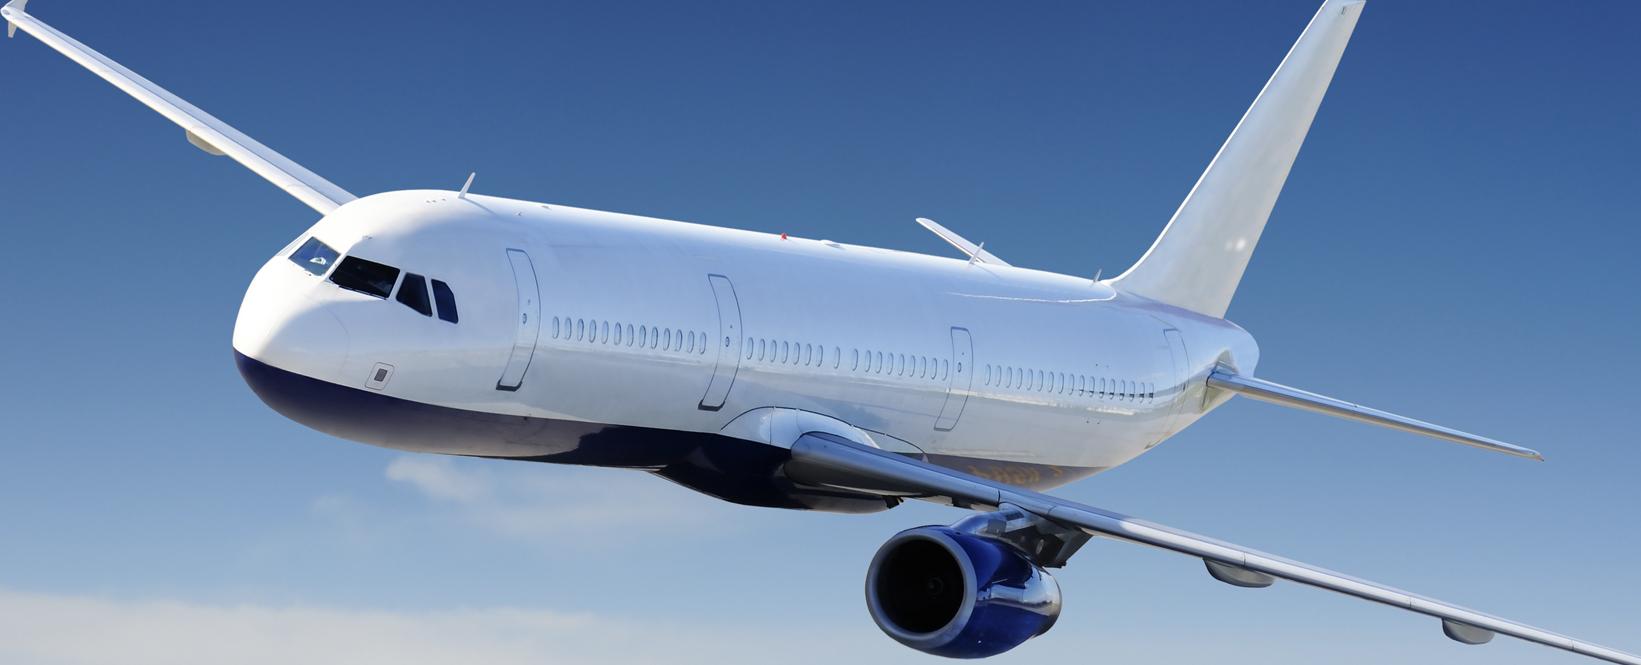 Aerospace Industry Header